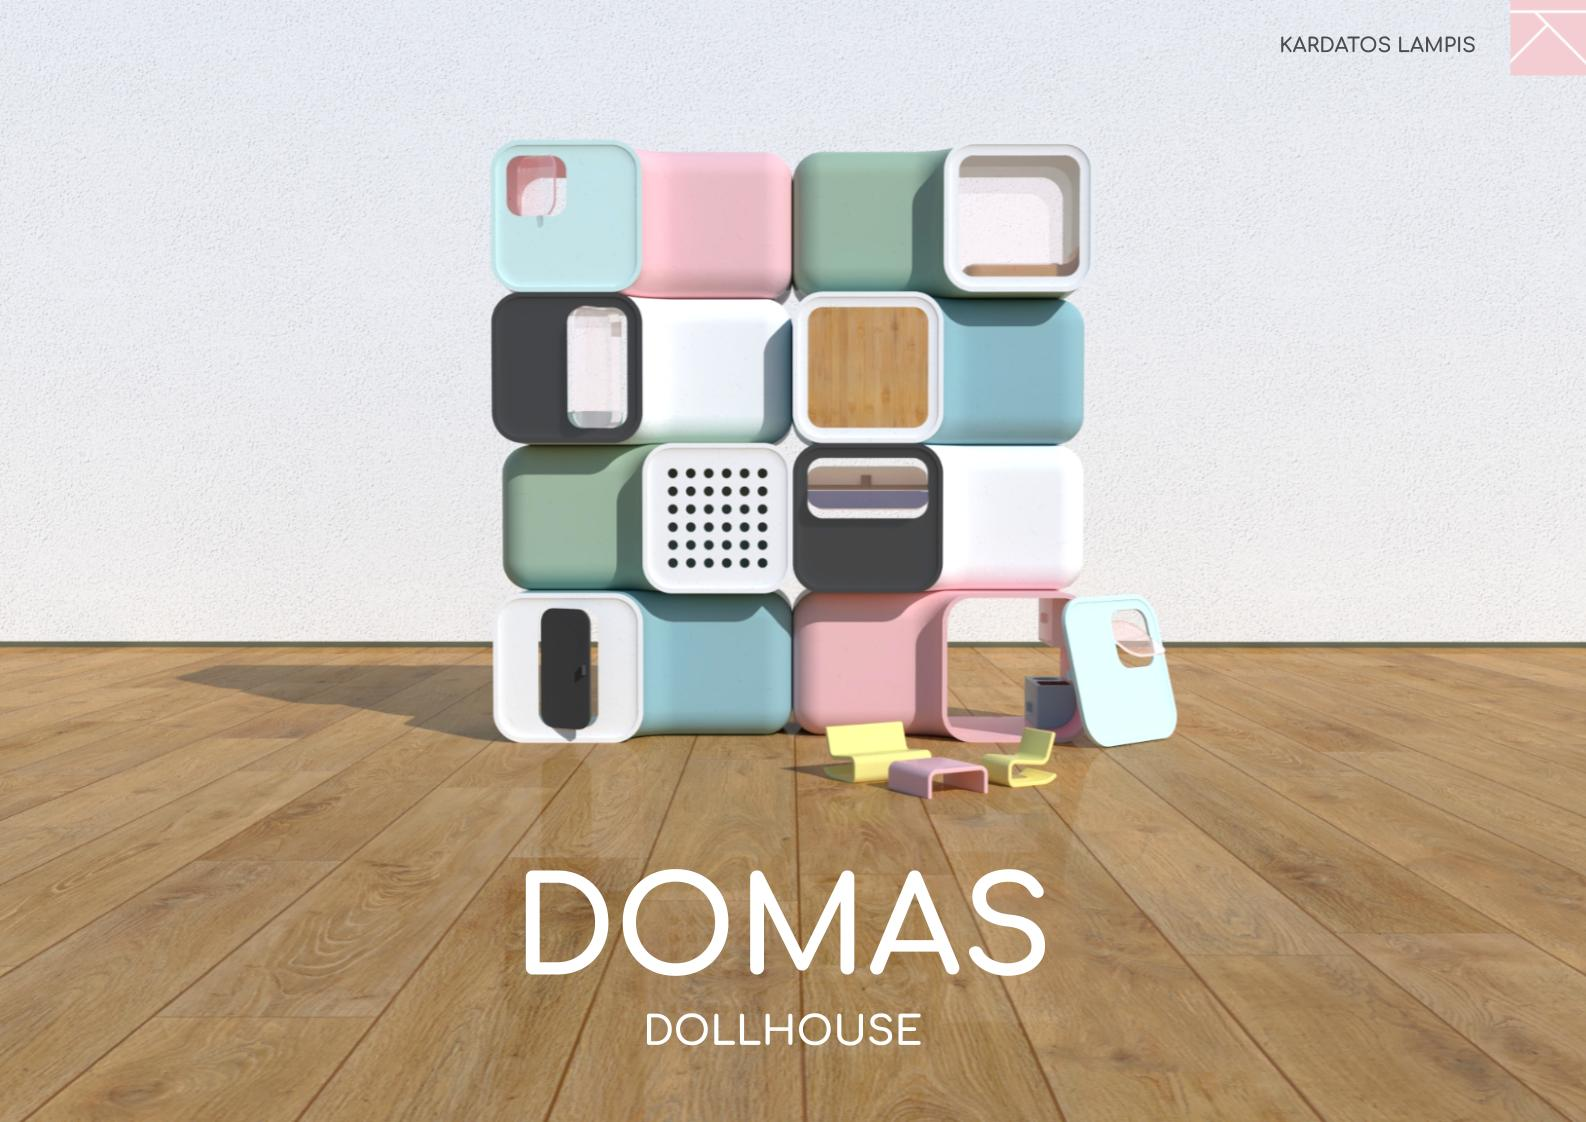 DOMAS DOLLHOUSE by KARDATOS LAMPIS - Creative Work